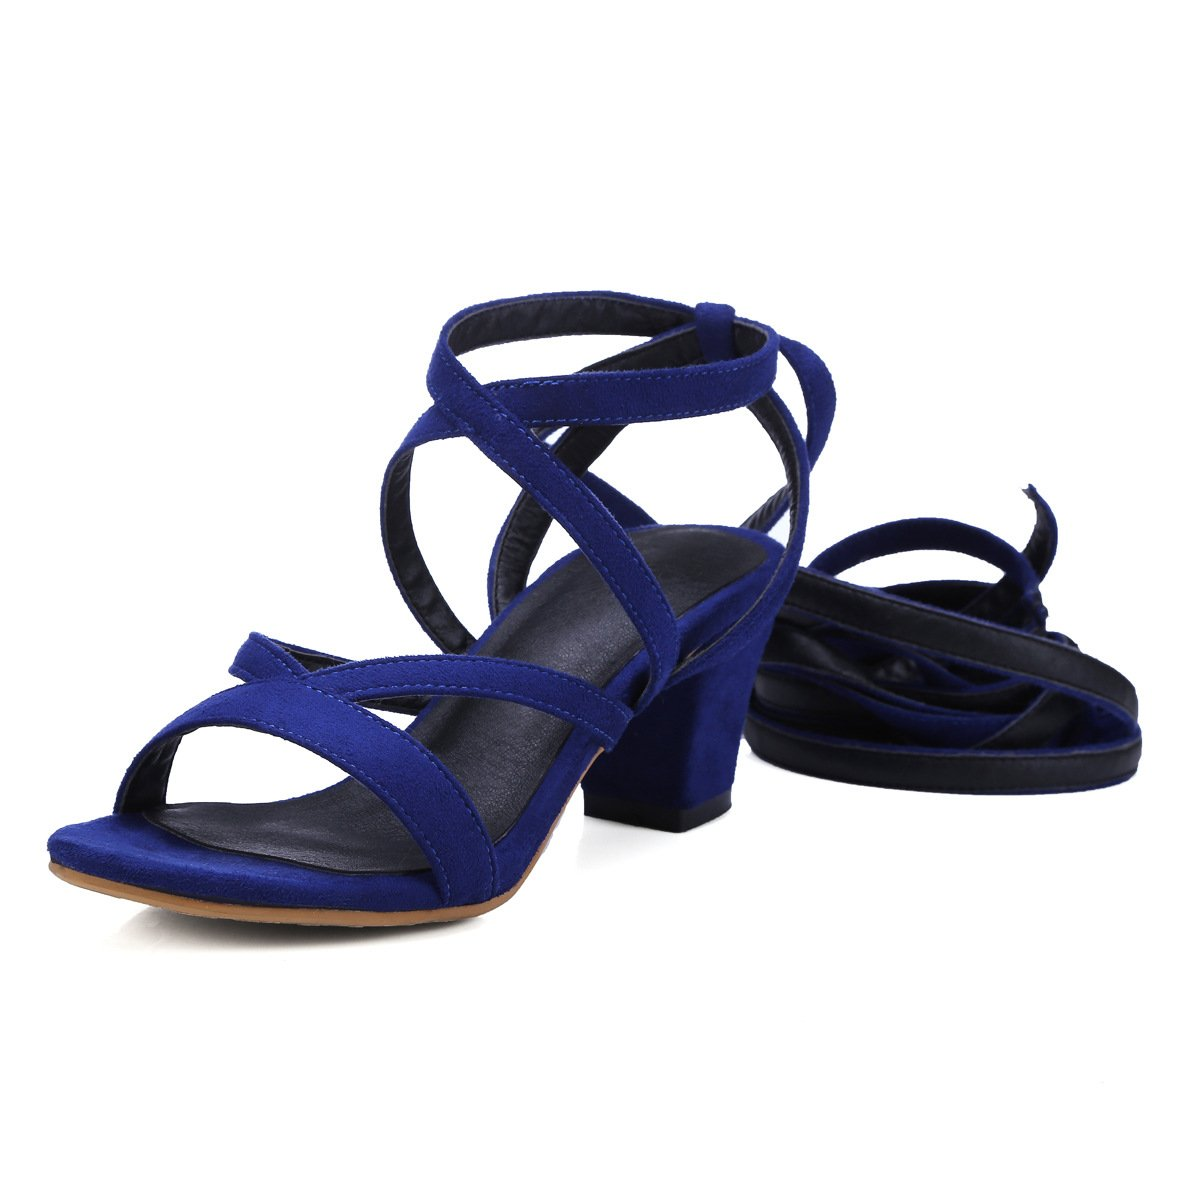 Unbekannt Sandalen Woherren Open Toe High Heels Dünnen Gürtel Gürtel Gürtel Riemchen Römische Schuhe Blau 39 c86cea